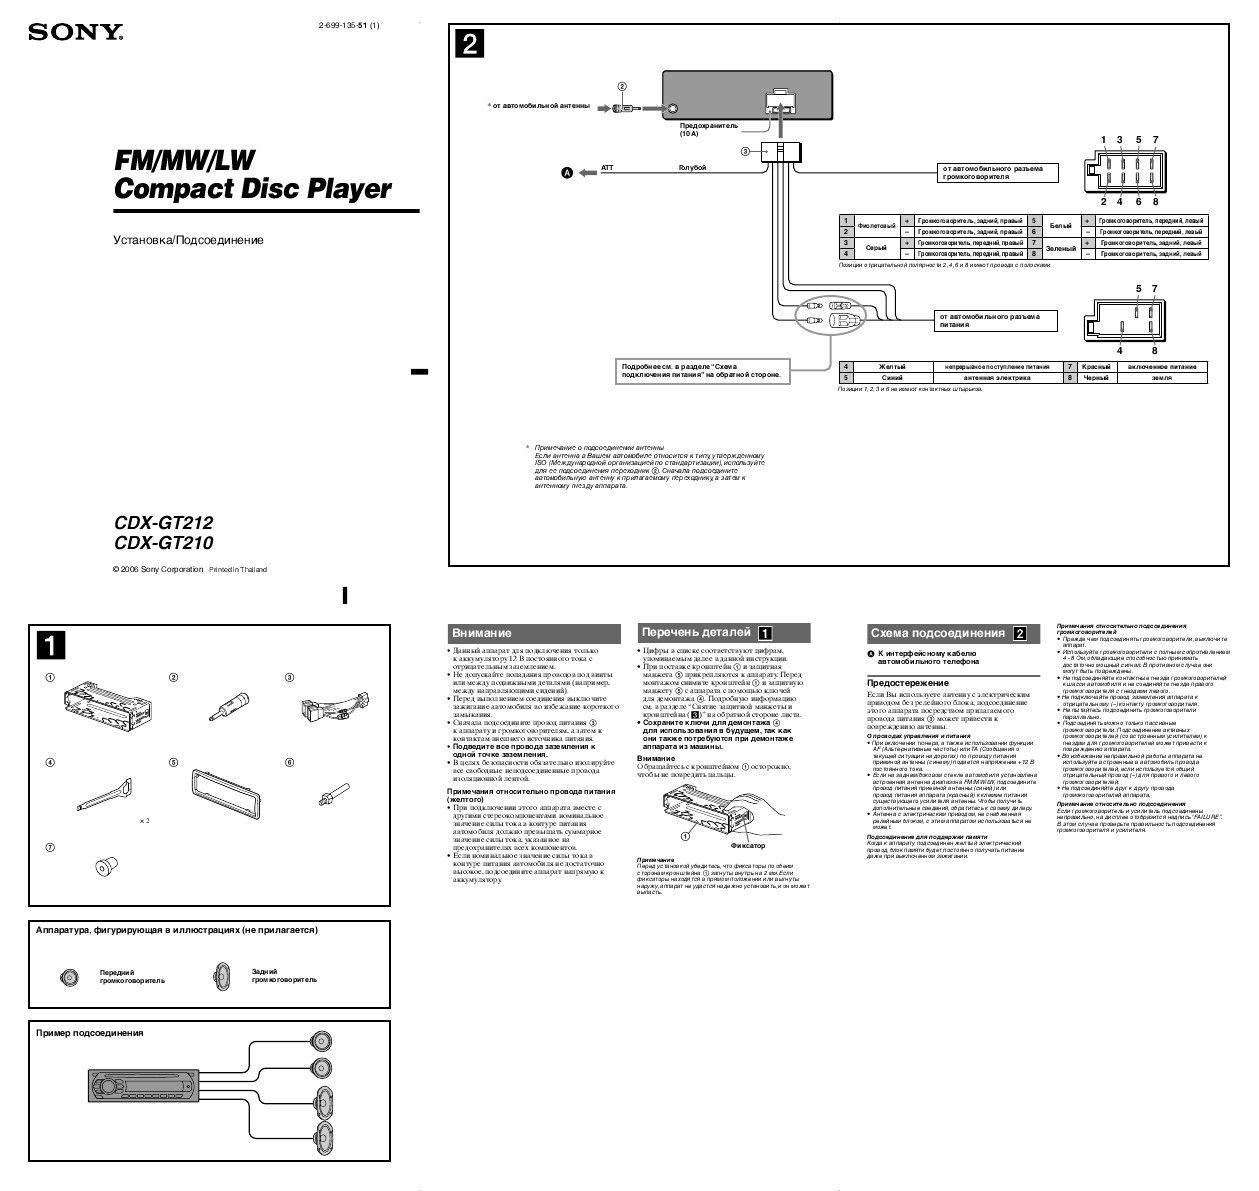 Groovy Sony Cdx Gt300Mp Wiring Diagram Cool 3 Way Switch Wiring Wiring Cloud Filiciilluminateatxorg